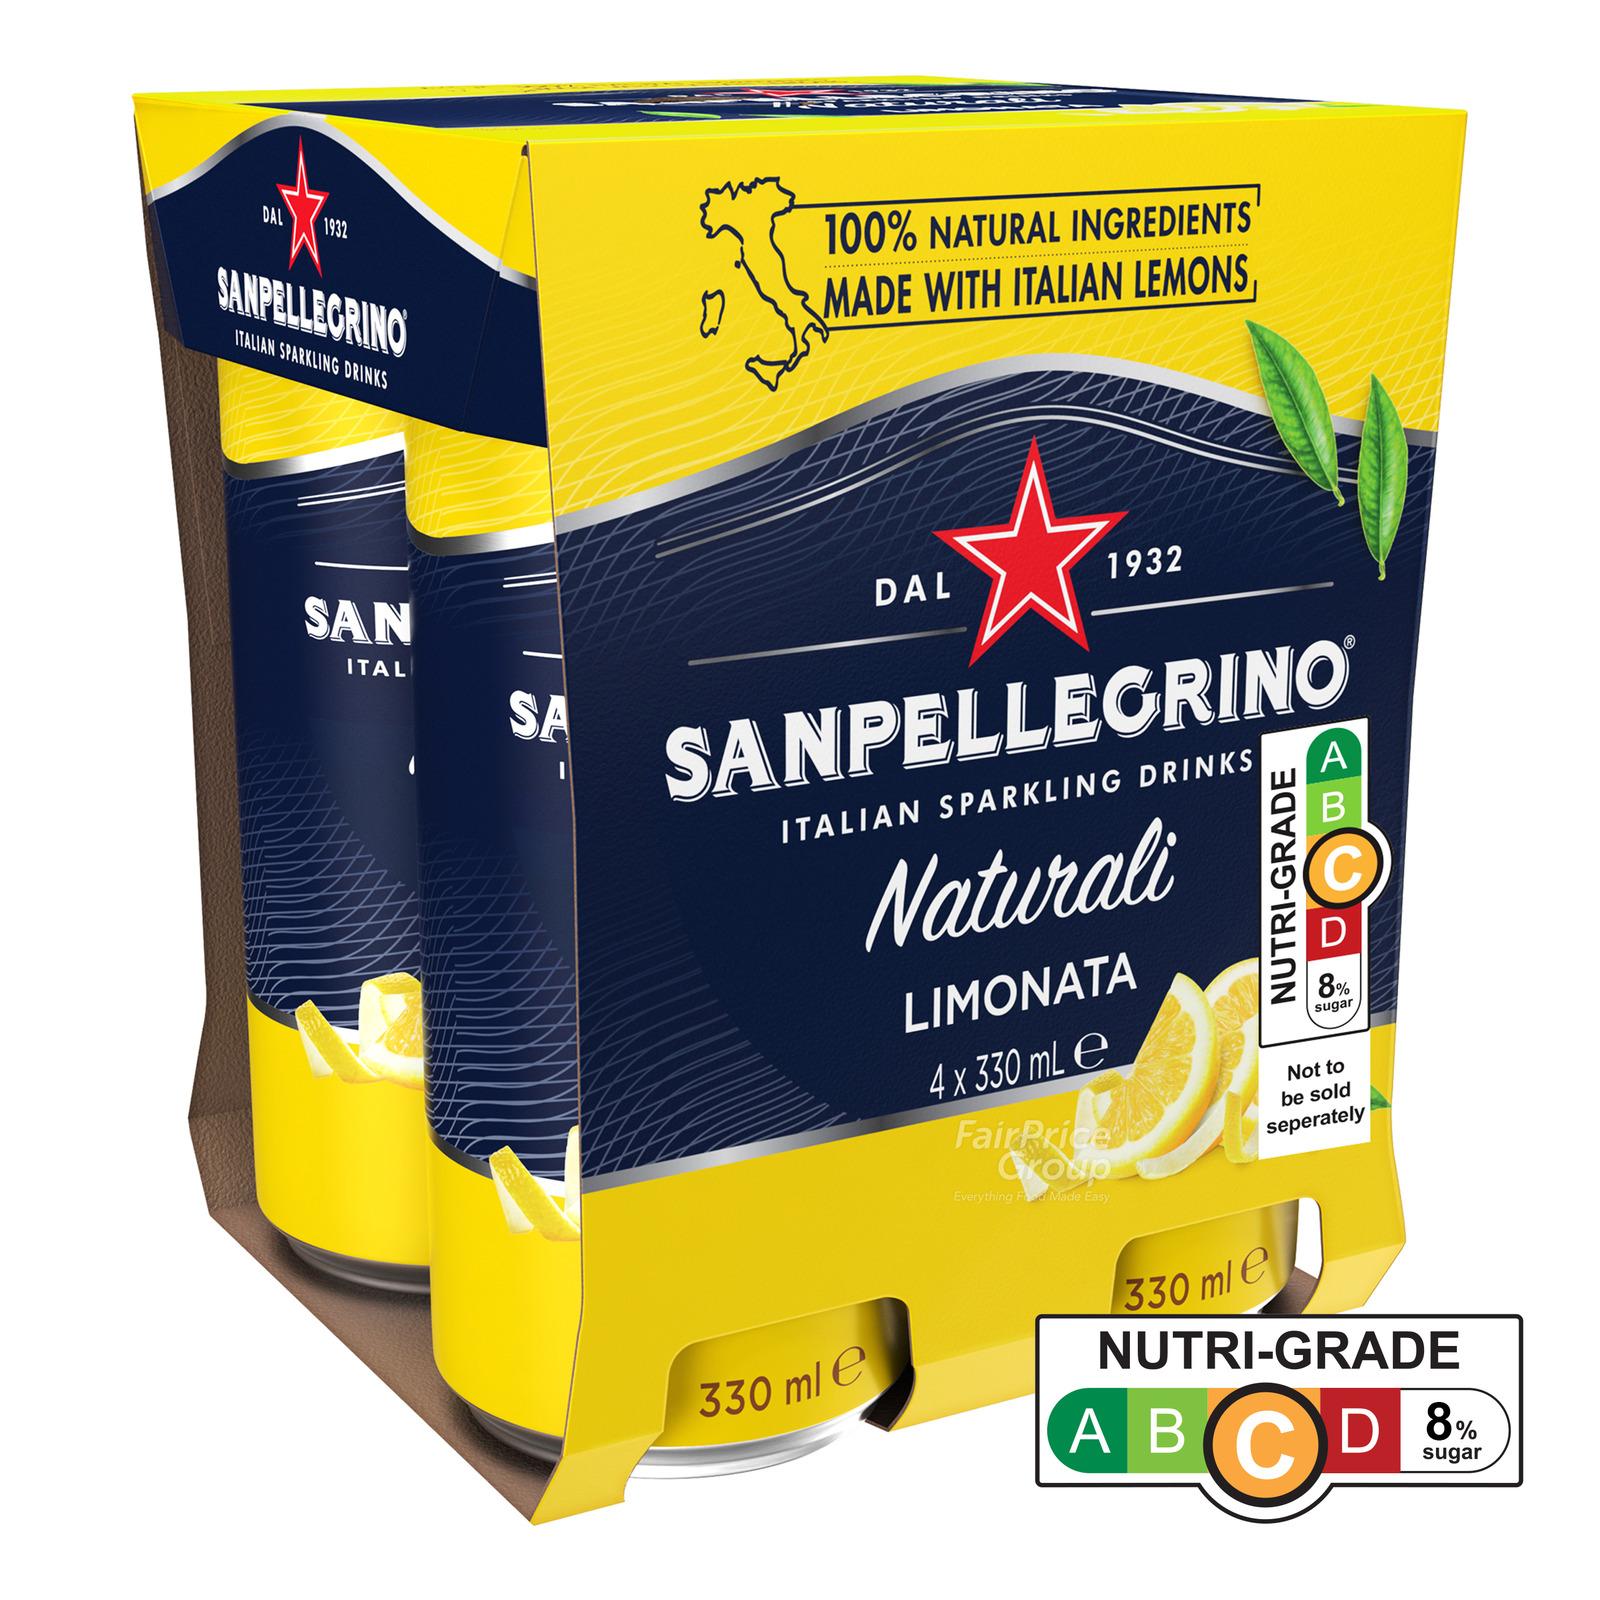 San Pellegirno Sparkling Can Drink - Limonata